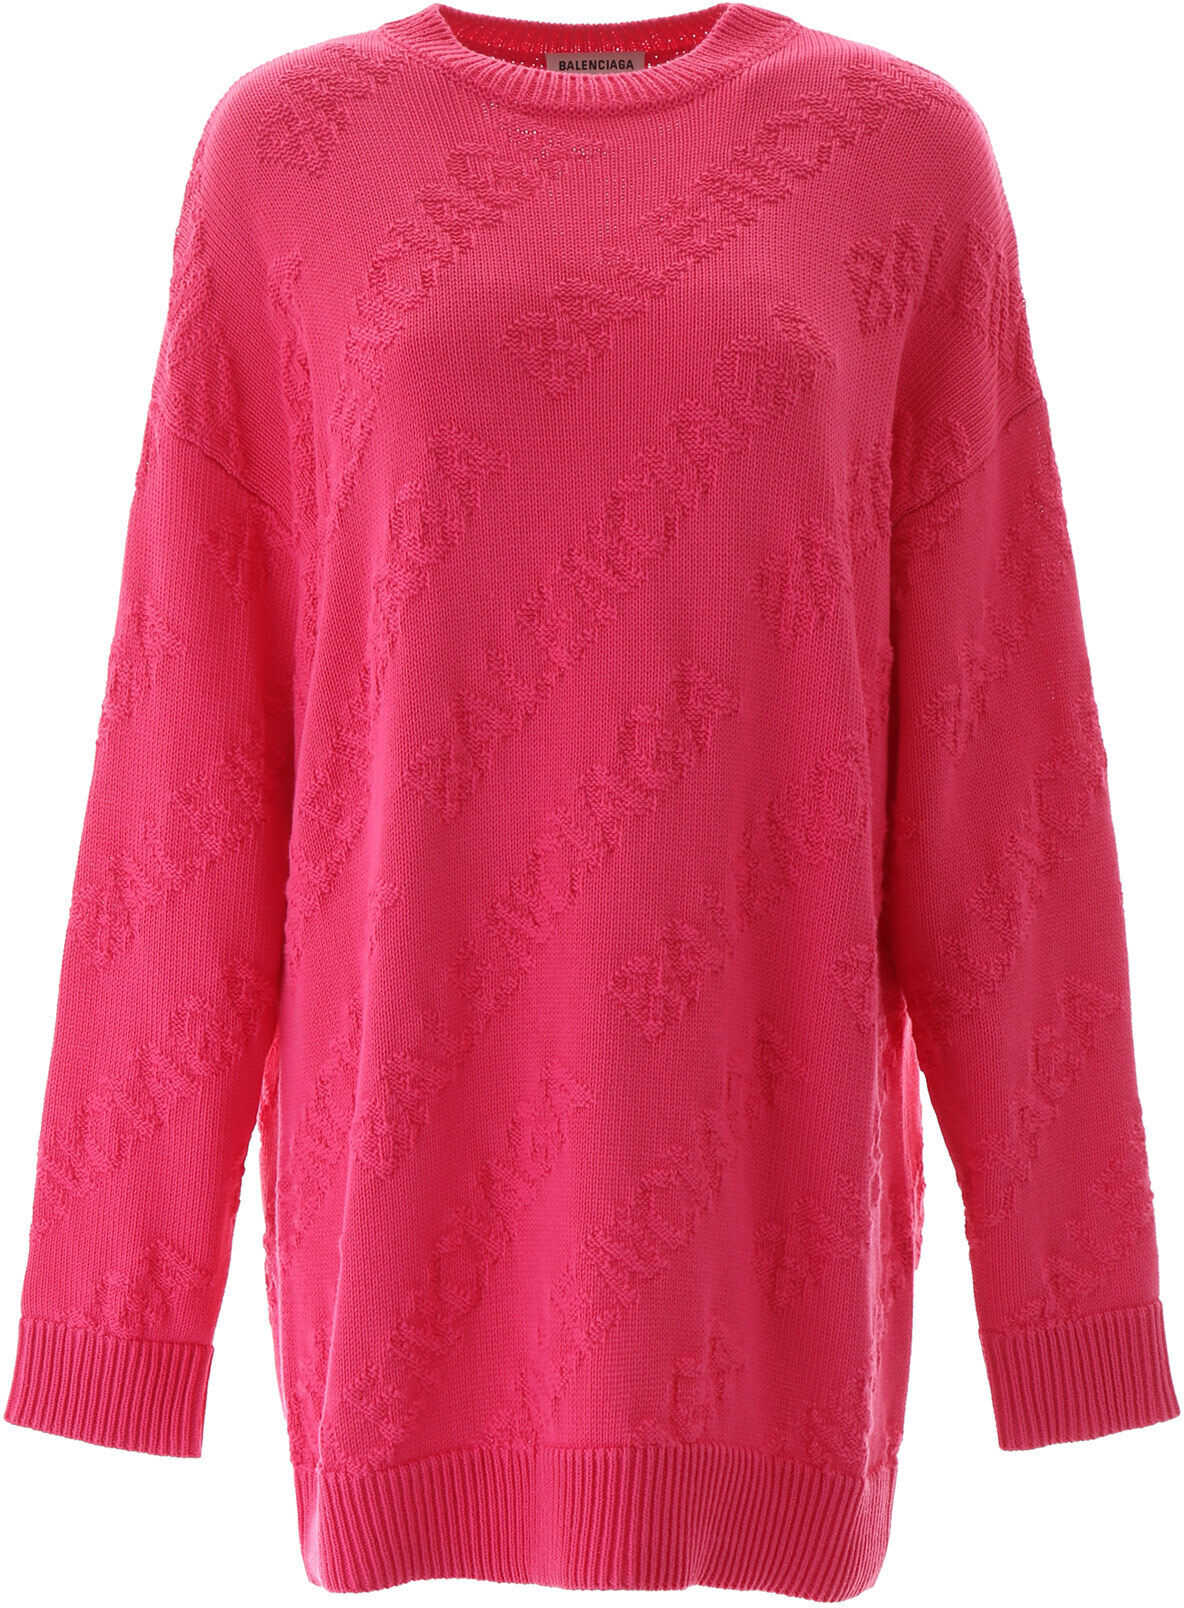 Balenciaga Jacquard Logo Pullover SHOCKING PINK